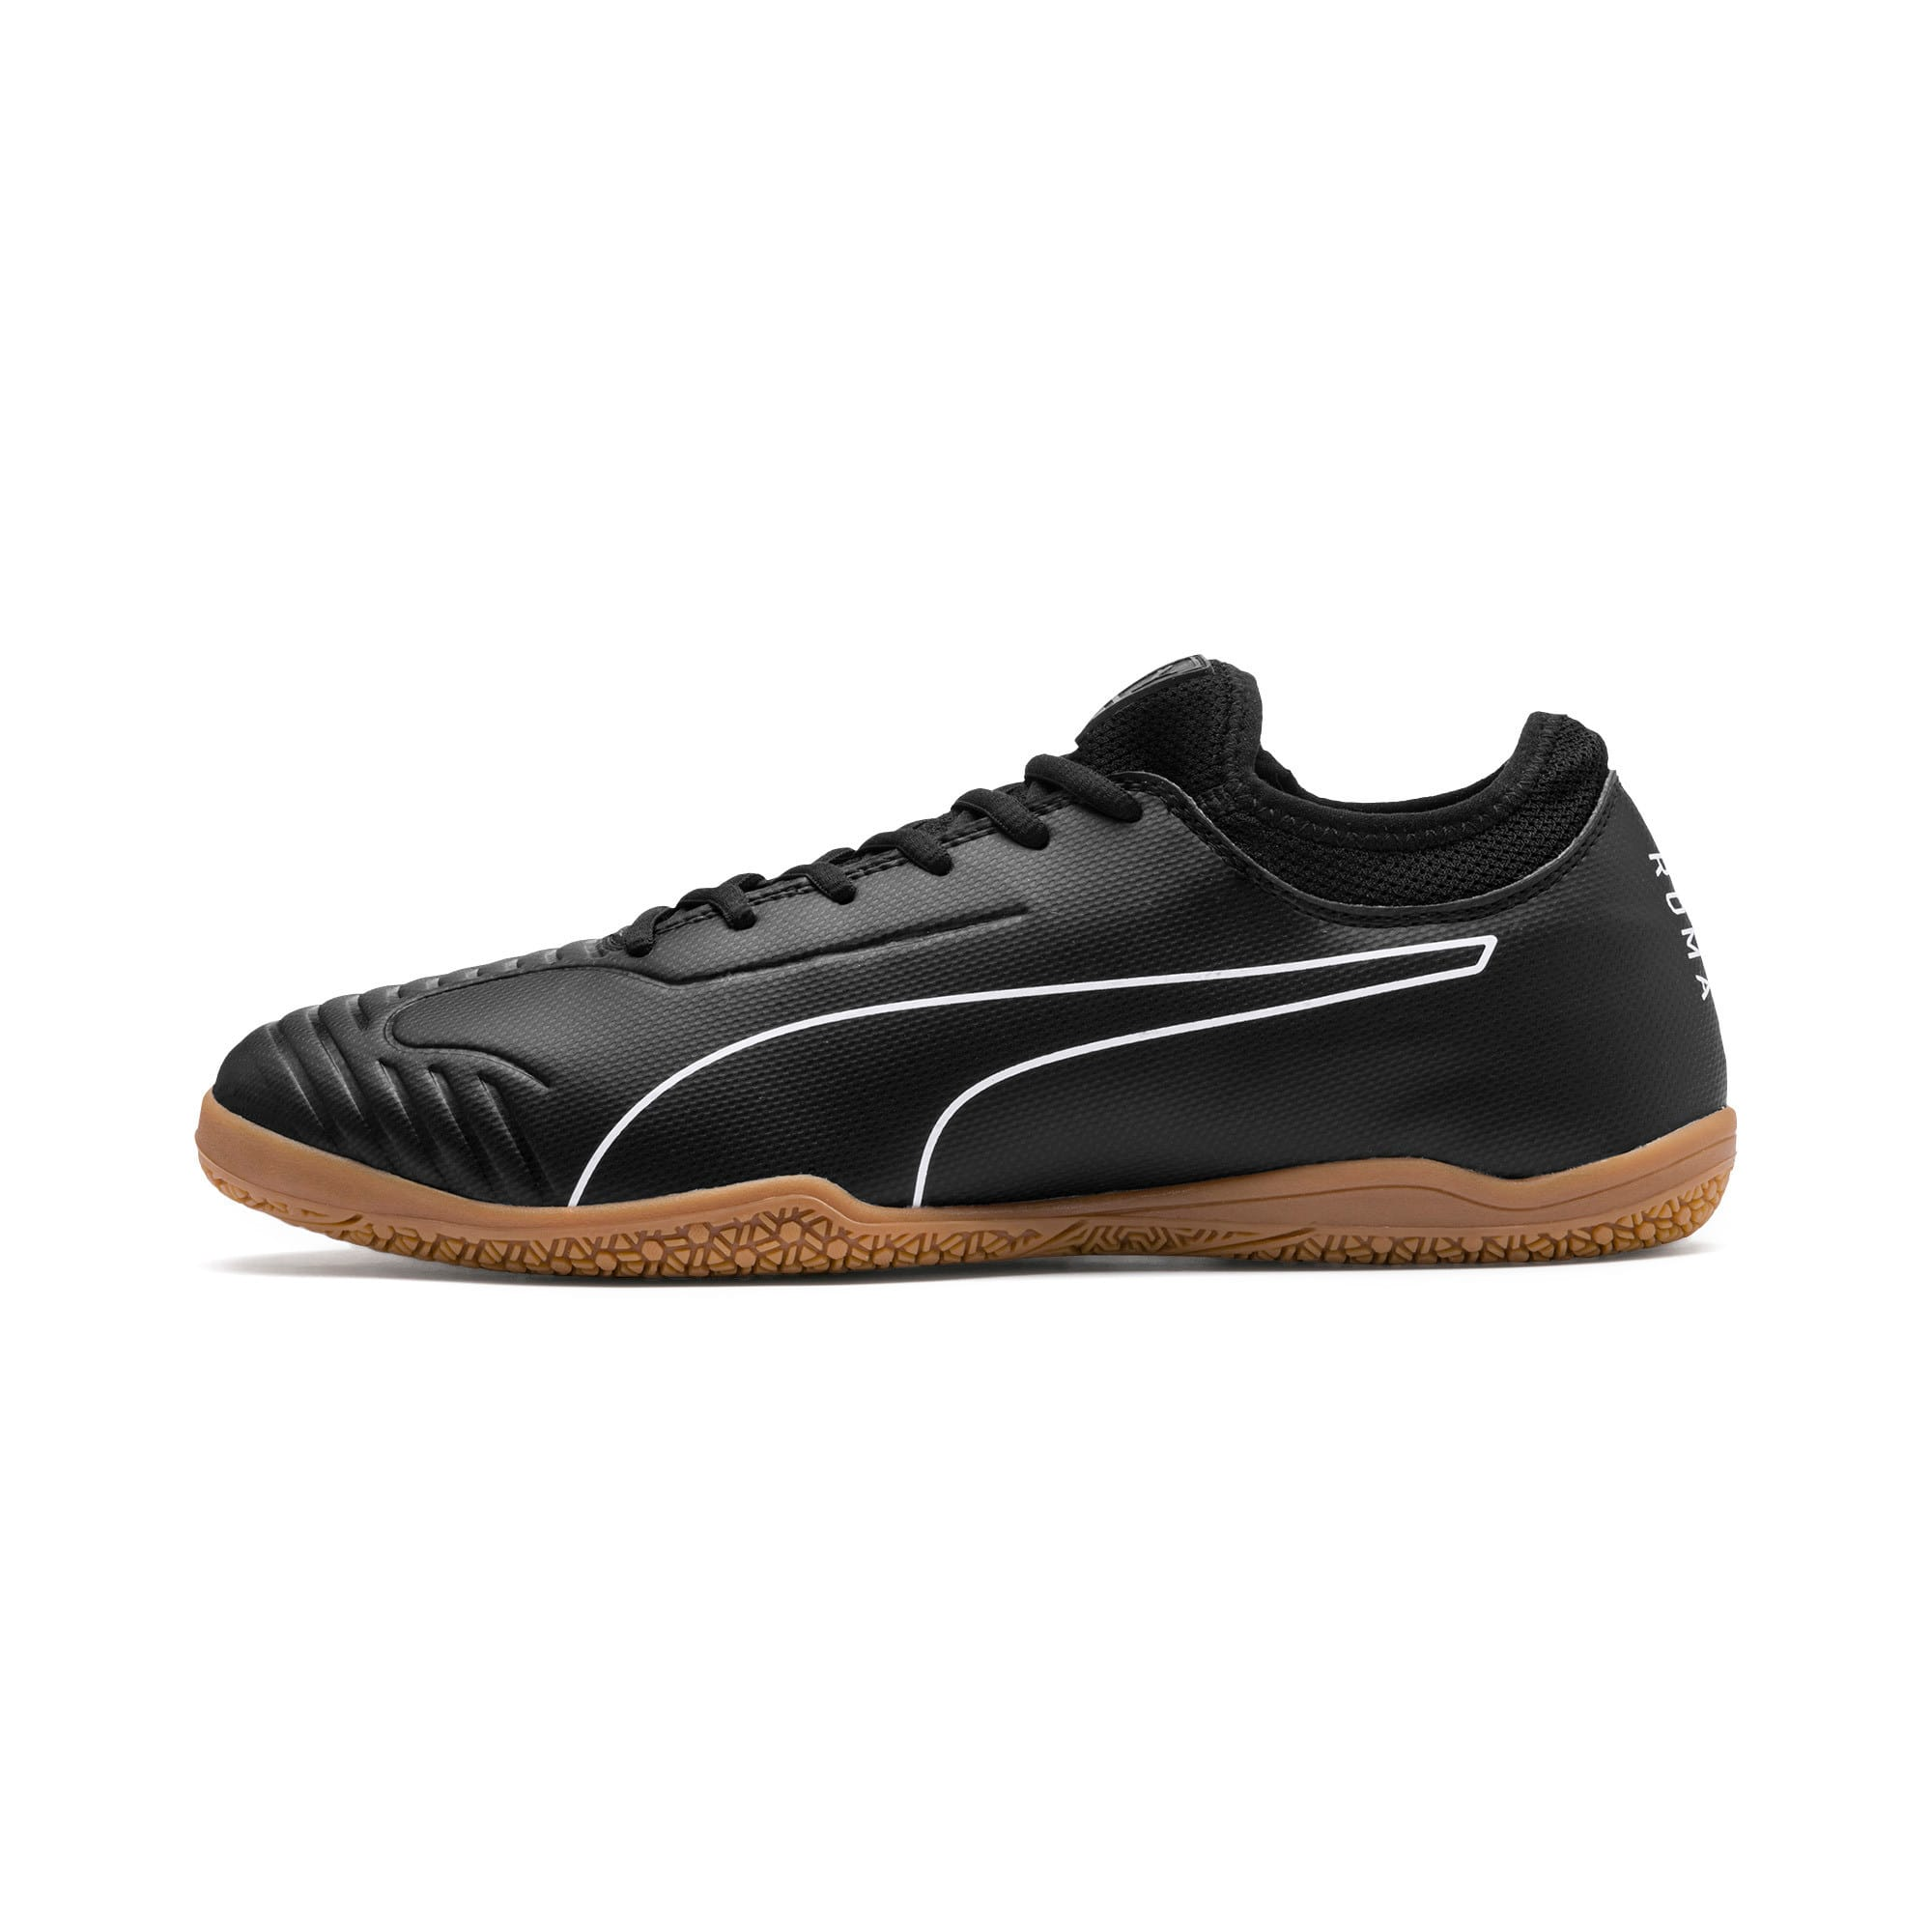 Thumbnail 1 of 365 Sala 2 Men's Football Boots, Puma Black-Puma White-Gum, medium